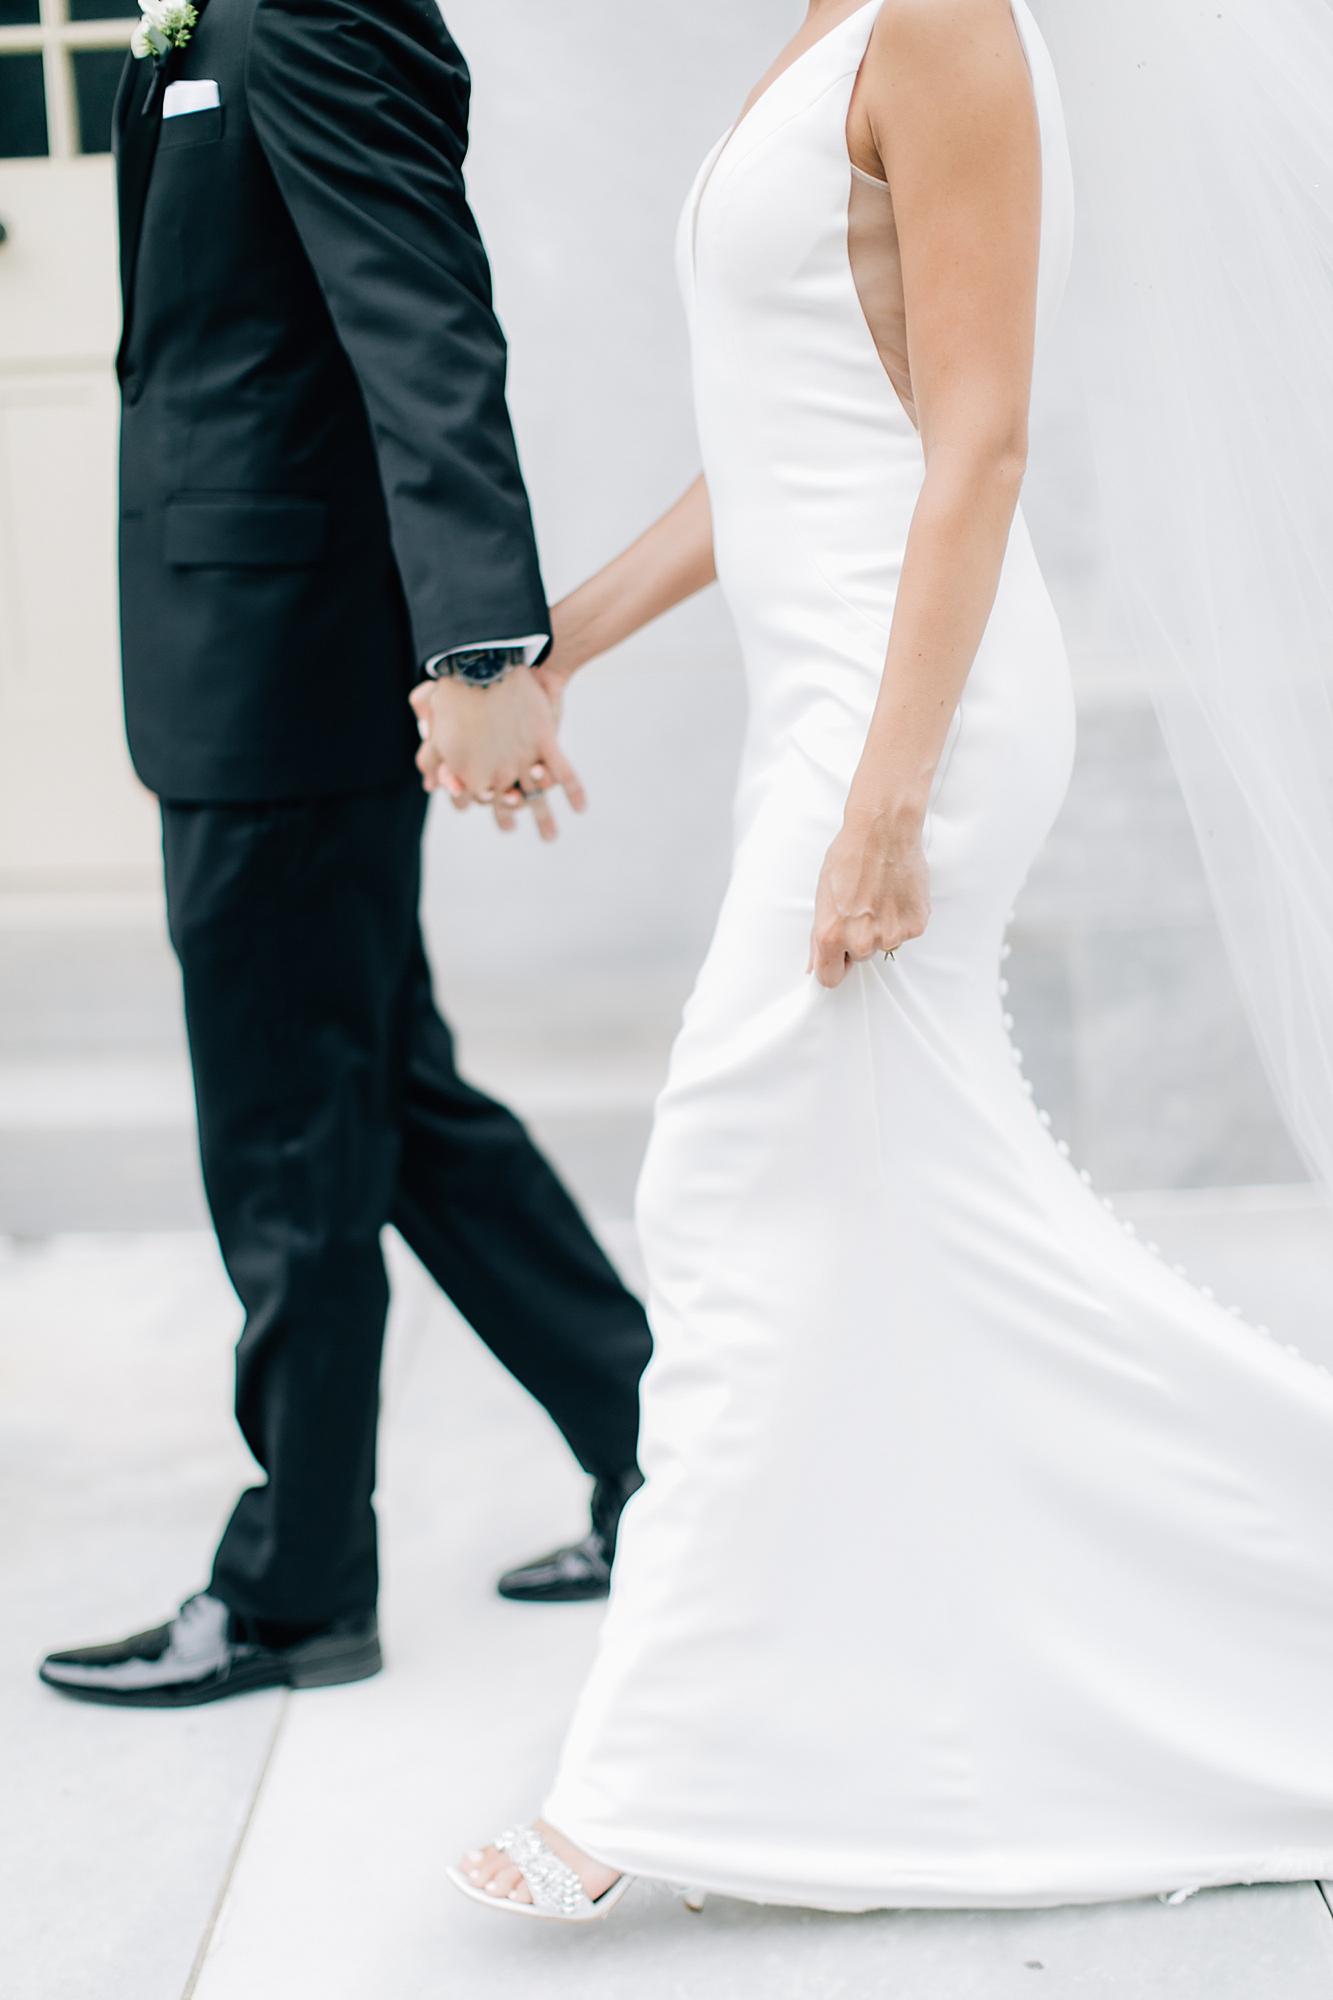 Cescaphe Philadelphia Film Wedding Photography by Magdalena Studios 38